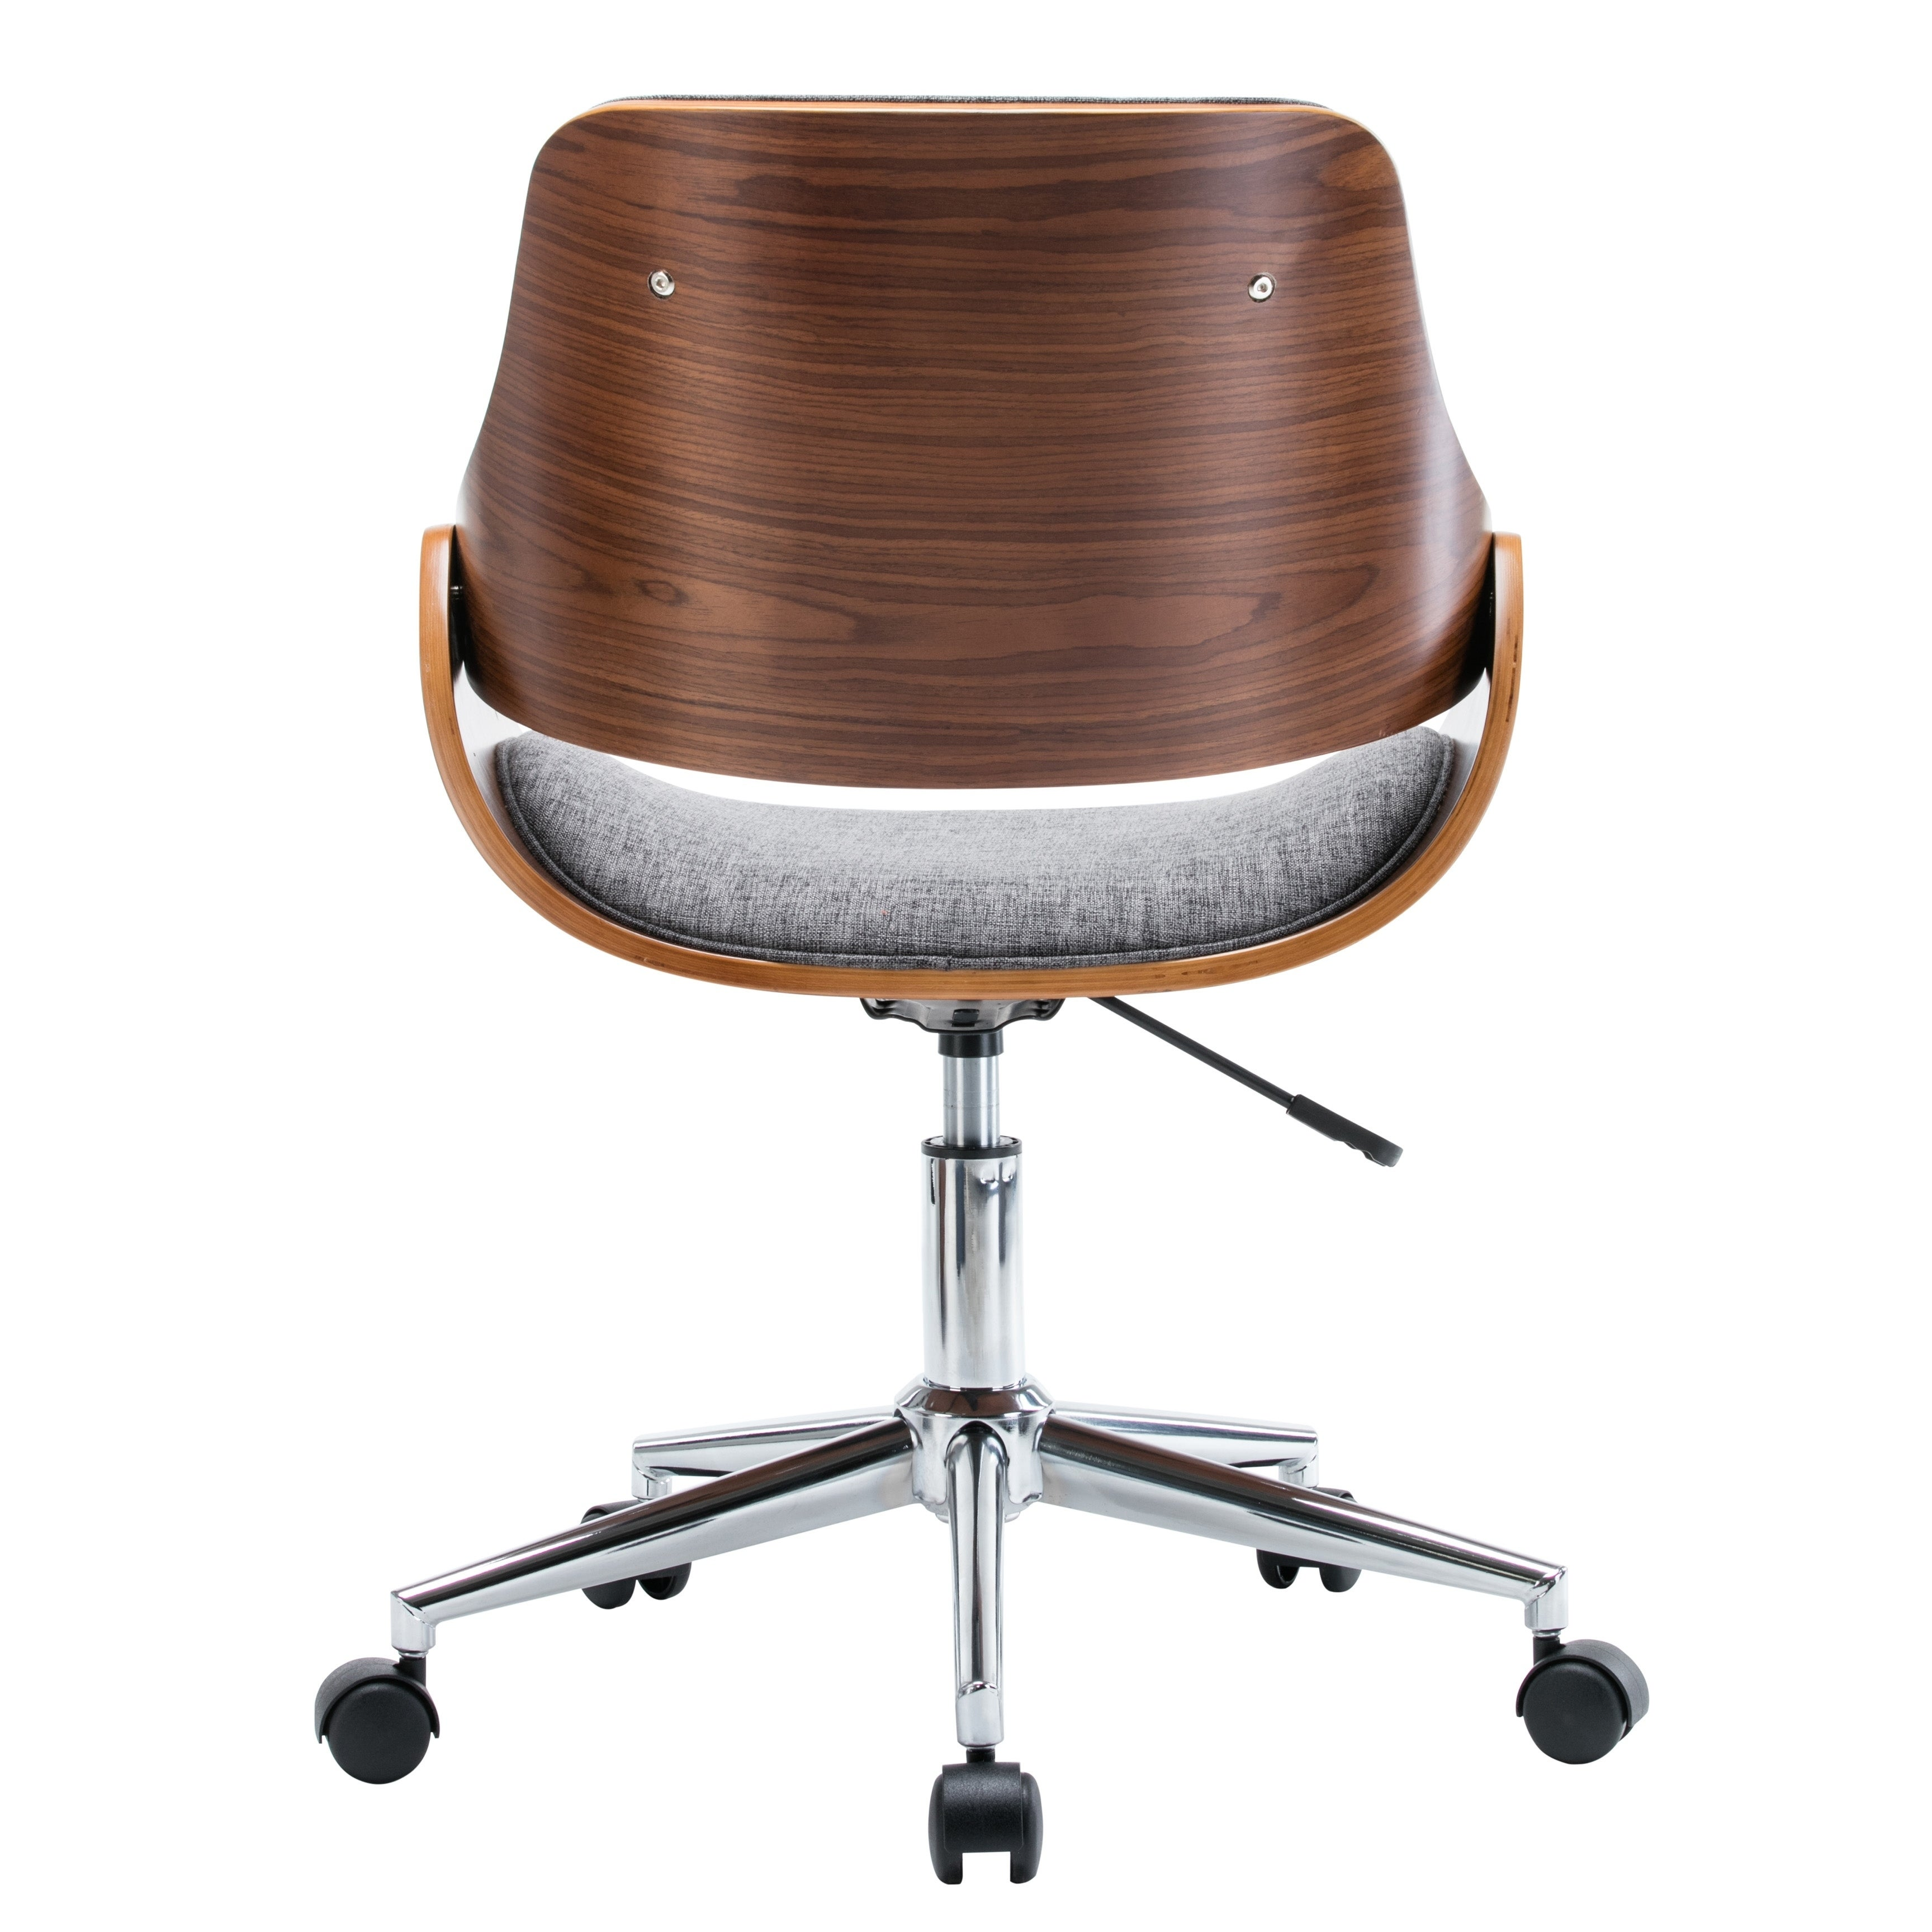 casters scraped la wheels for mm bay office mesa caster hardwood hand x detail chair in desk maple flooring wide floors hampton